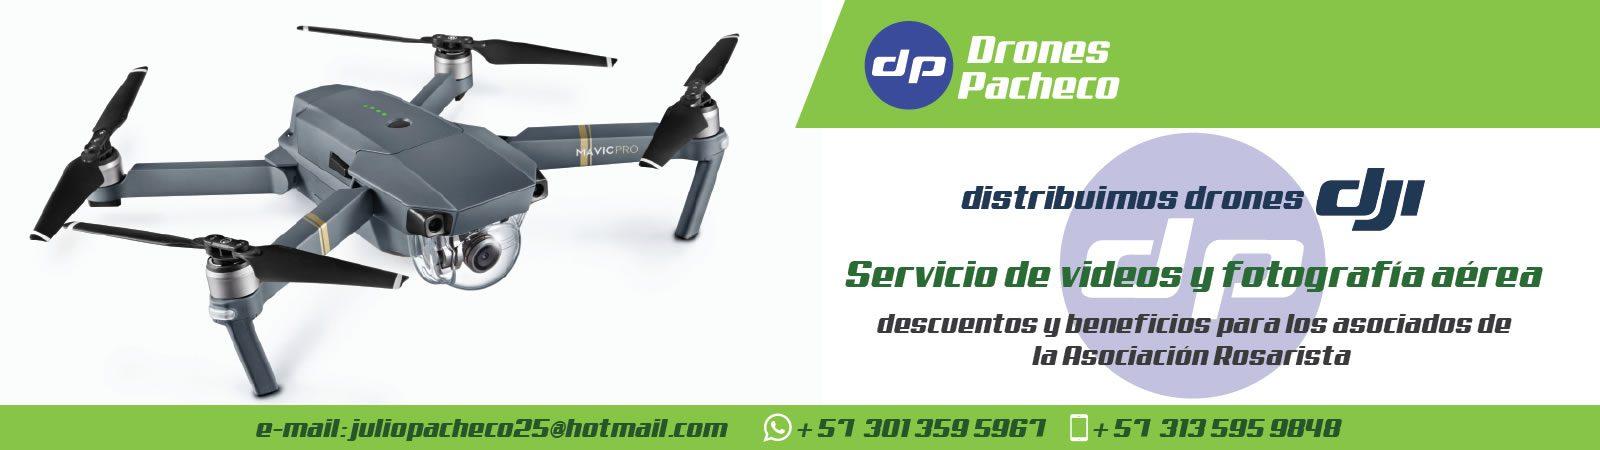 Drones Pacheco